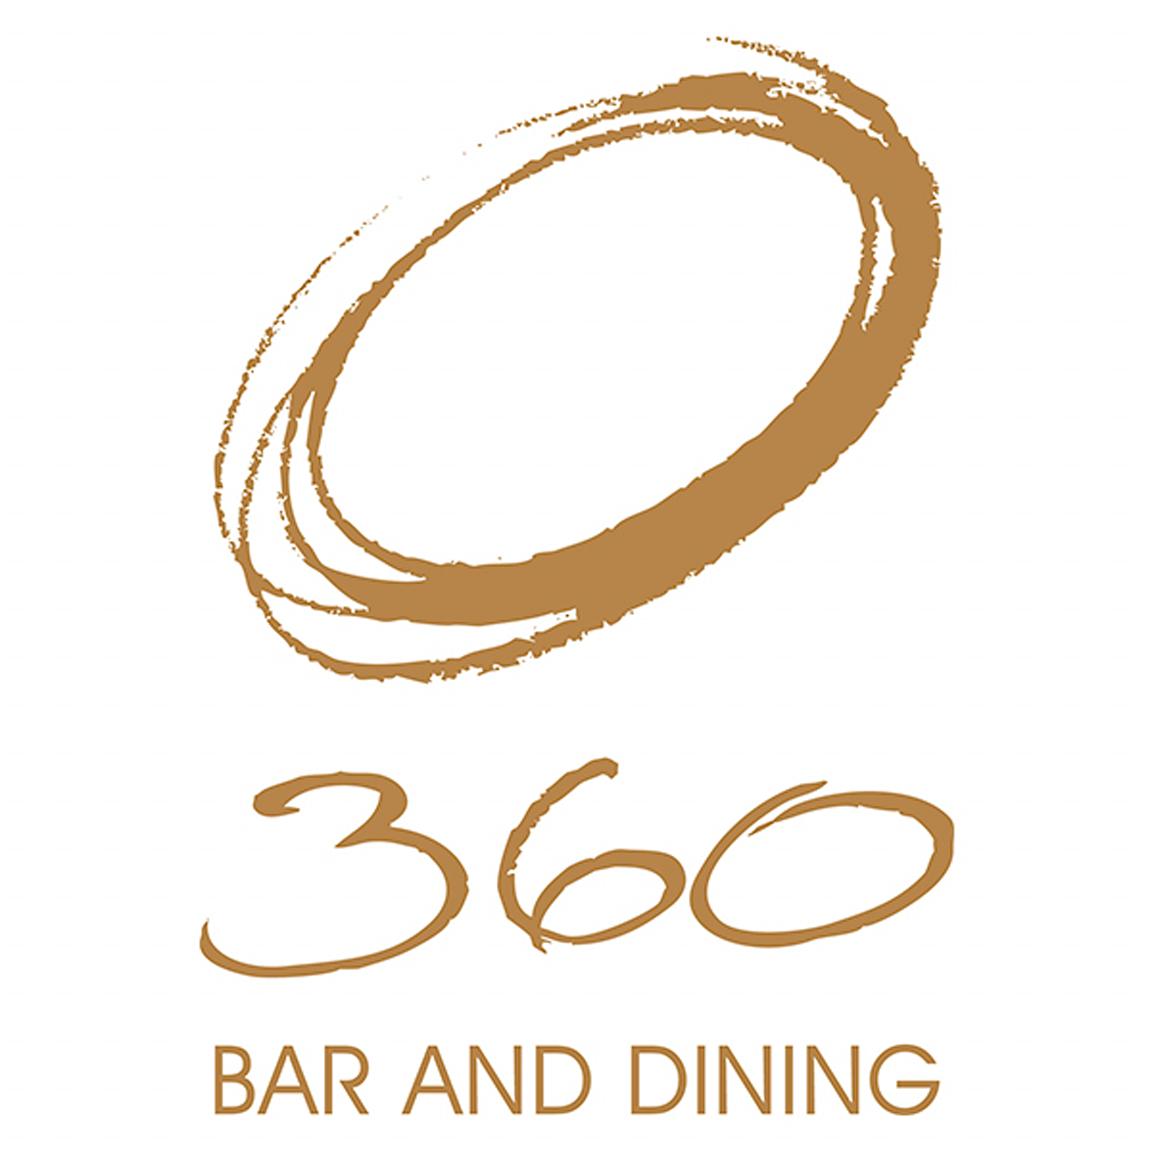 360-bar-and-dining-logo